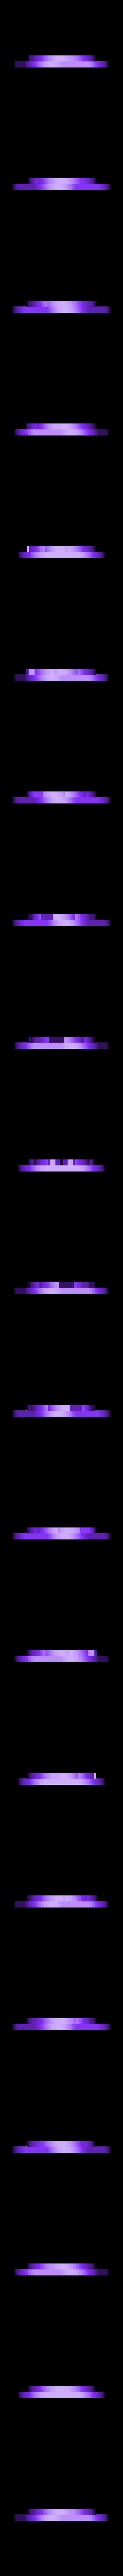 jedi token.STL Download free STL file Jedi token • 3D printing object, pacoag